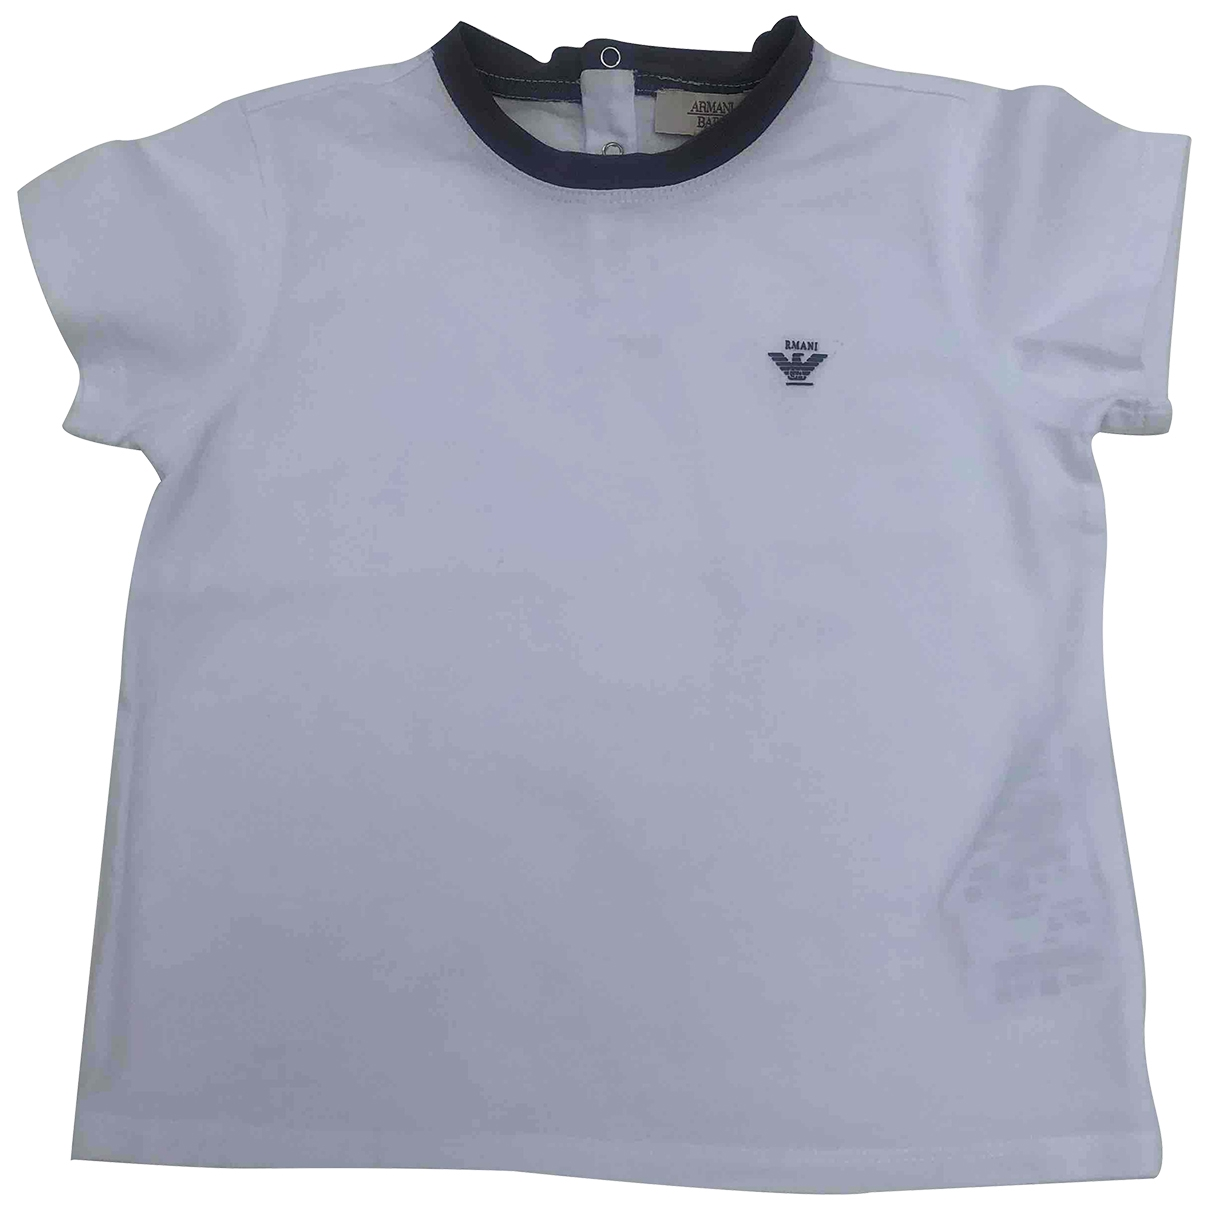 Camiseta Armani Baby